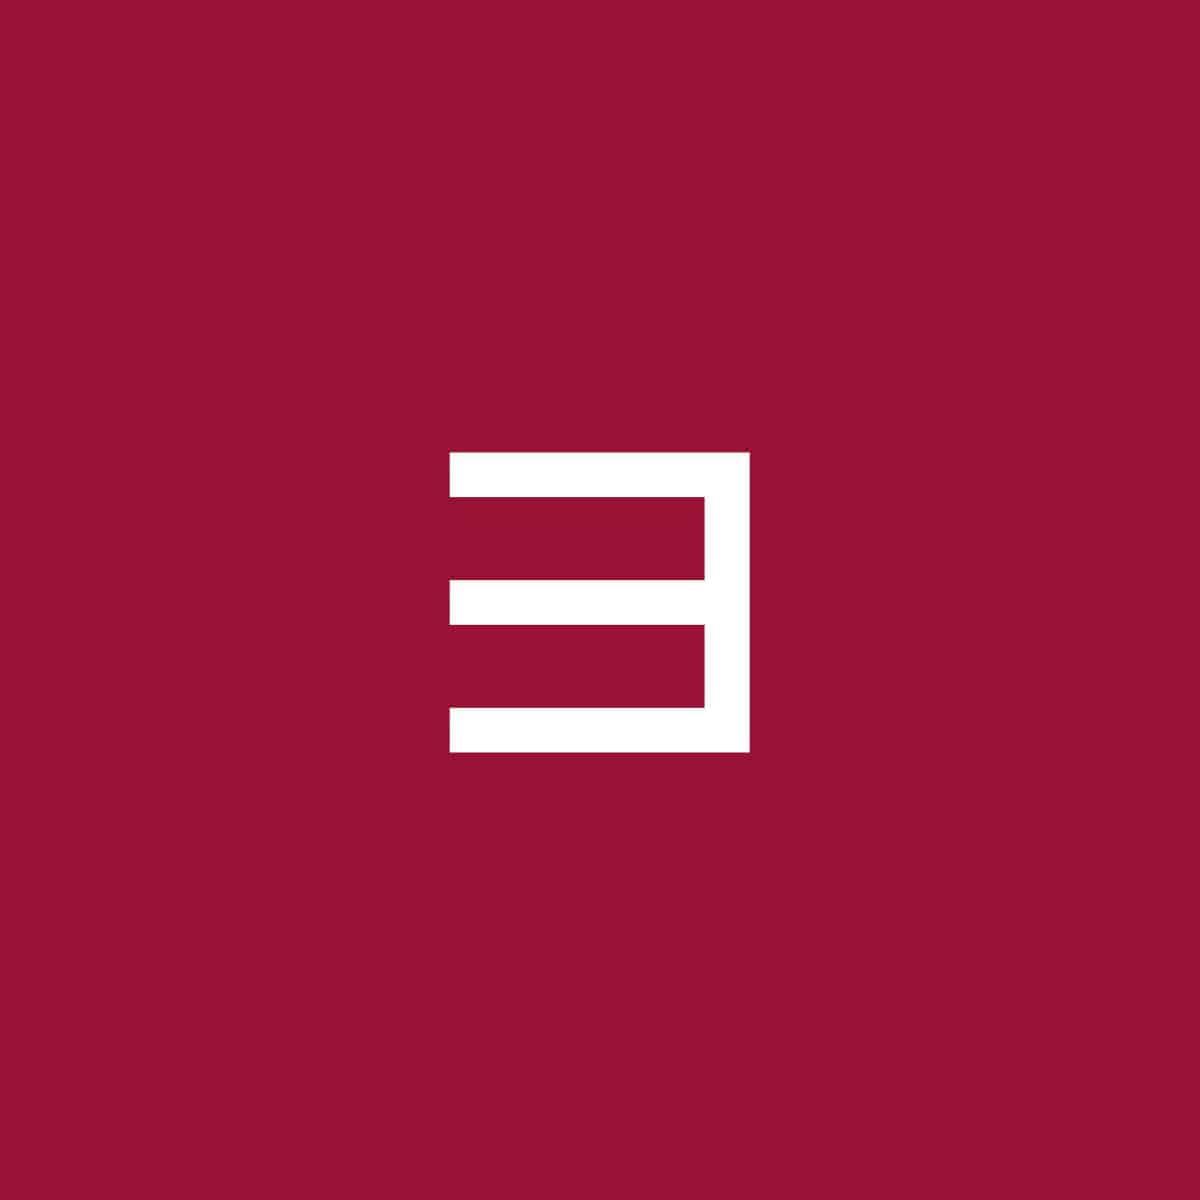 icon-8.jpg